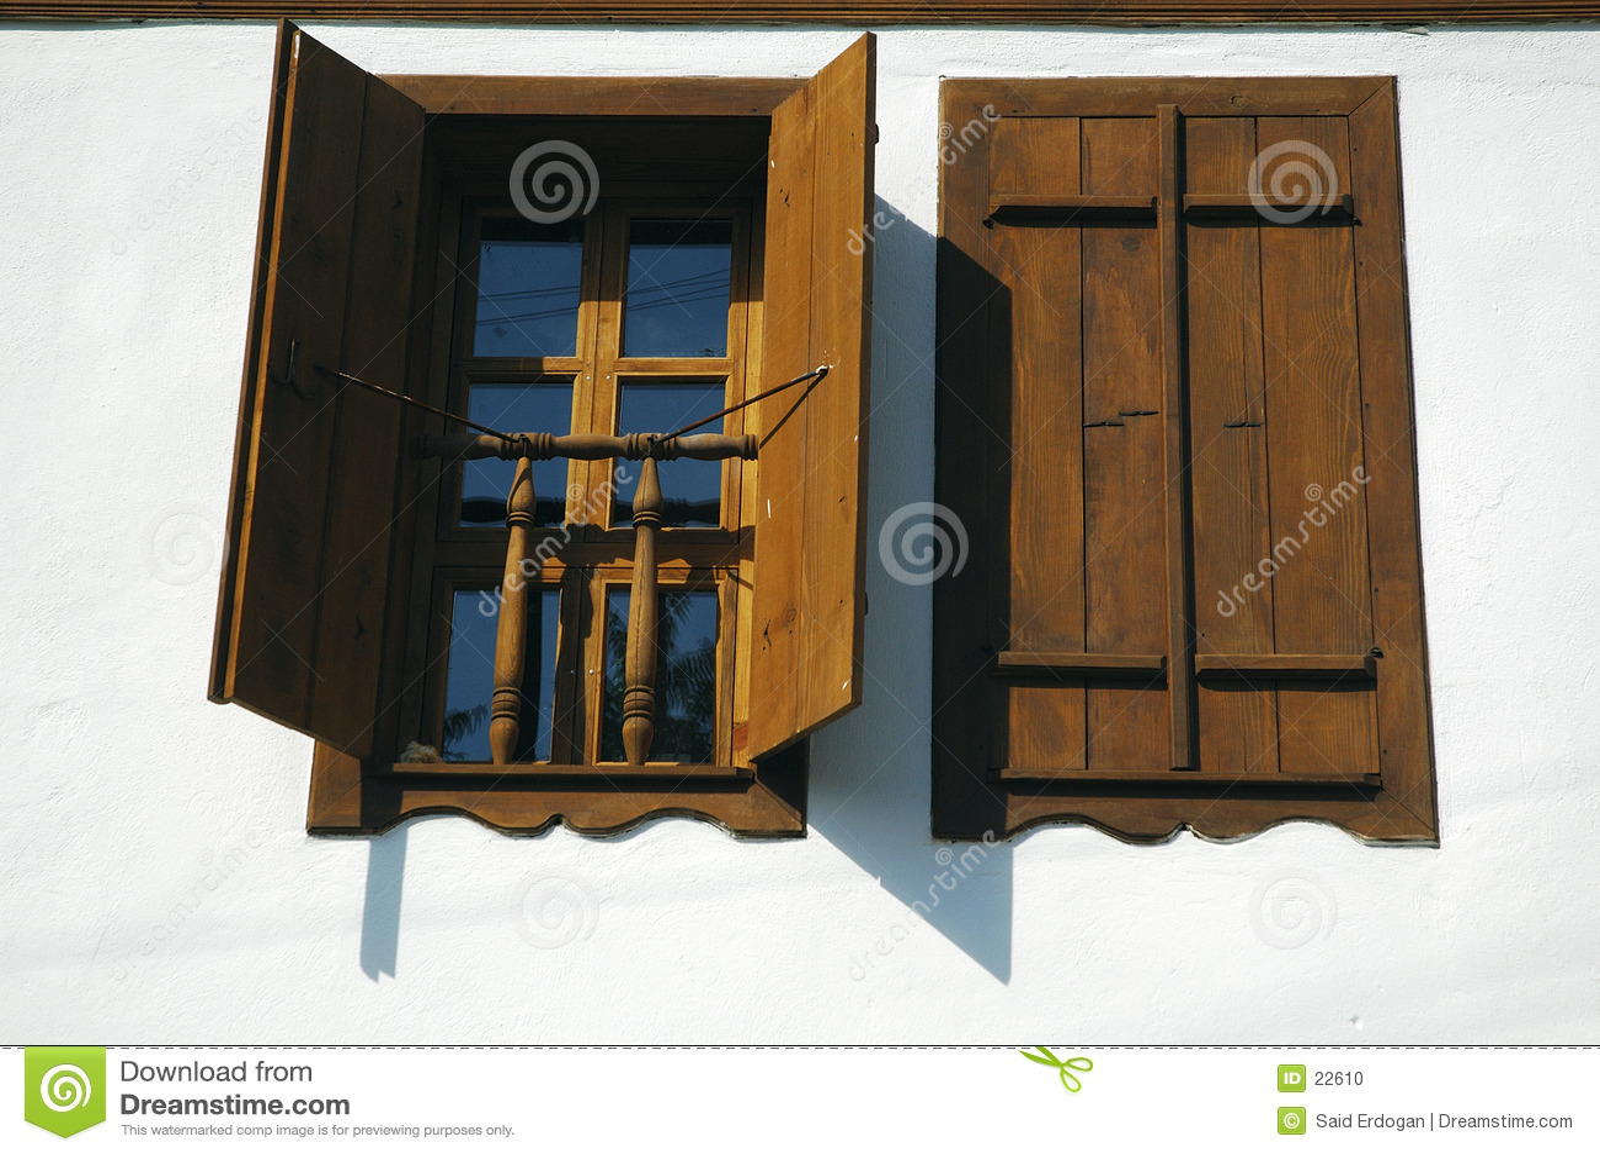 Podwójne okna